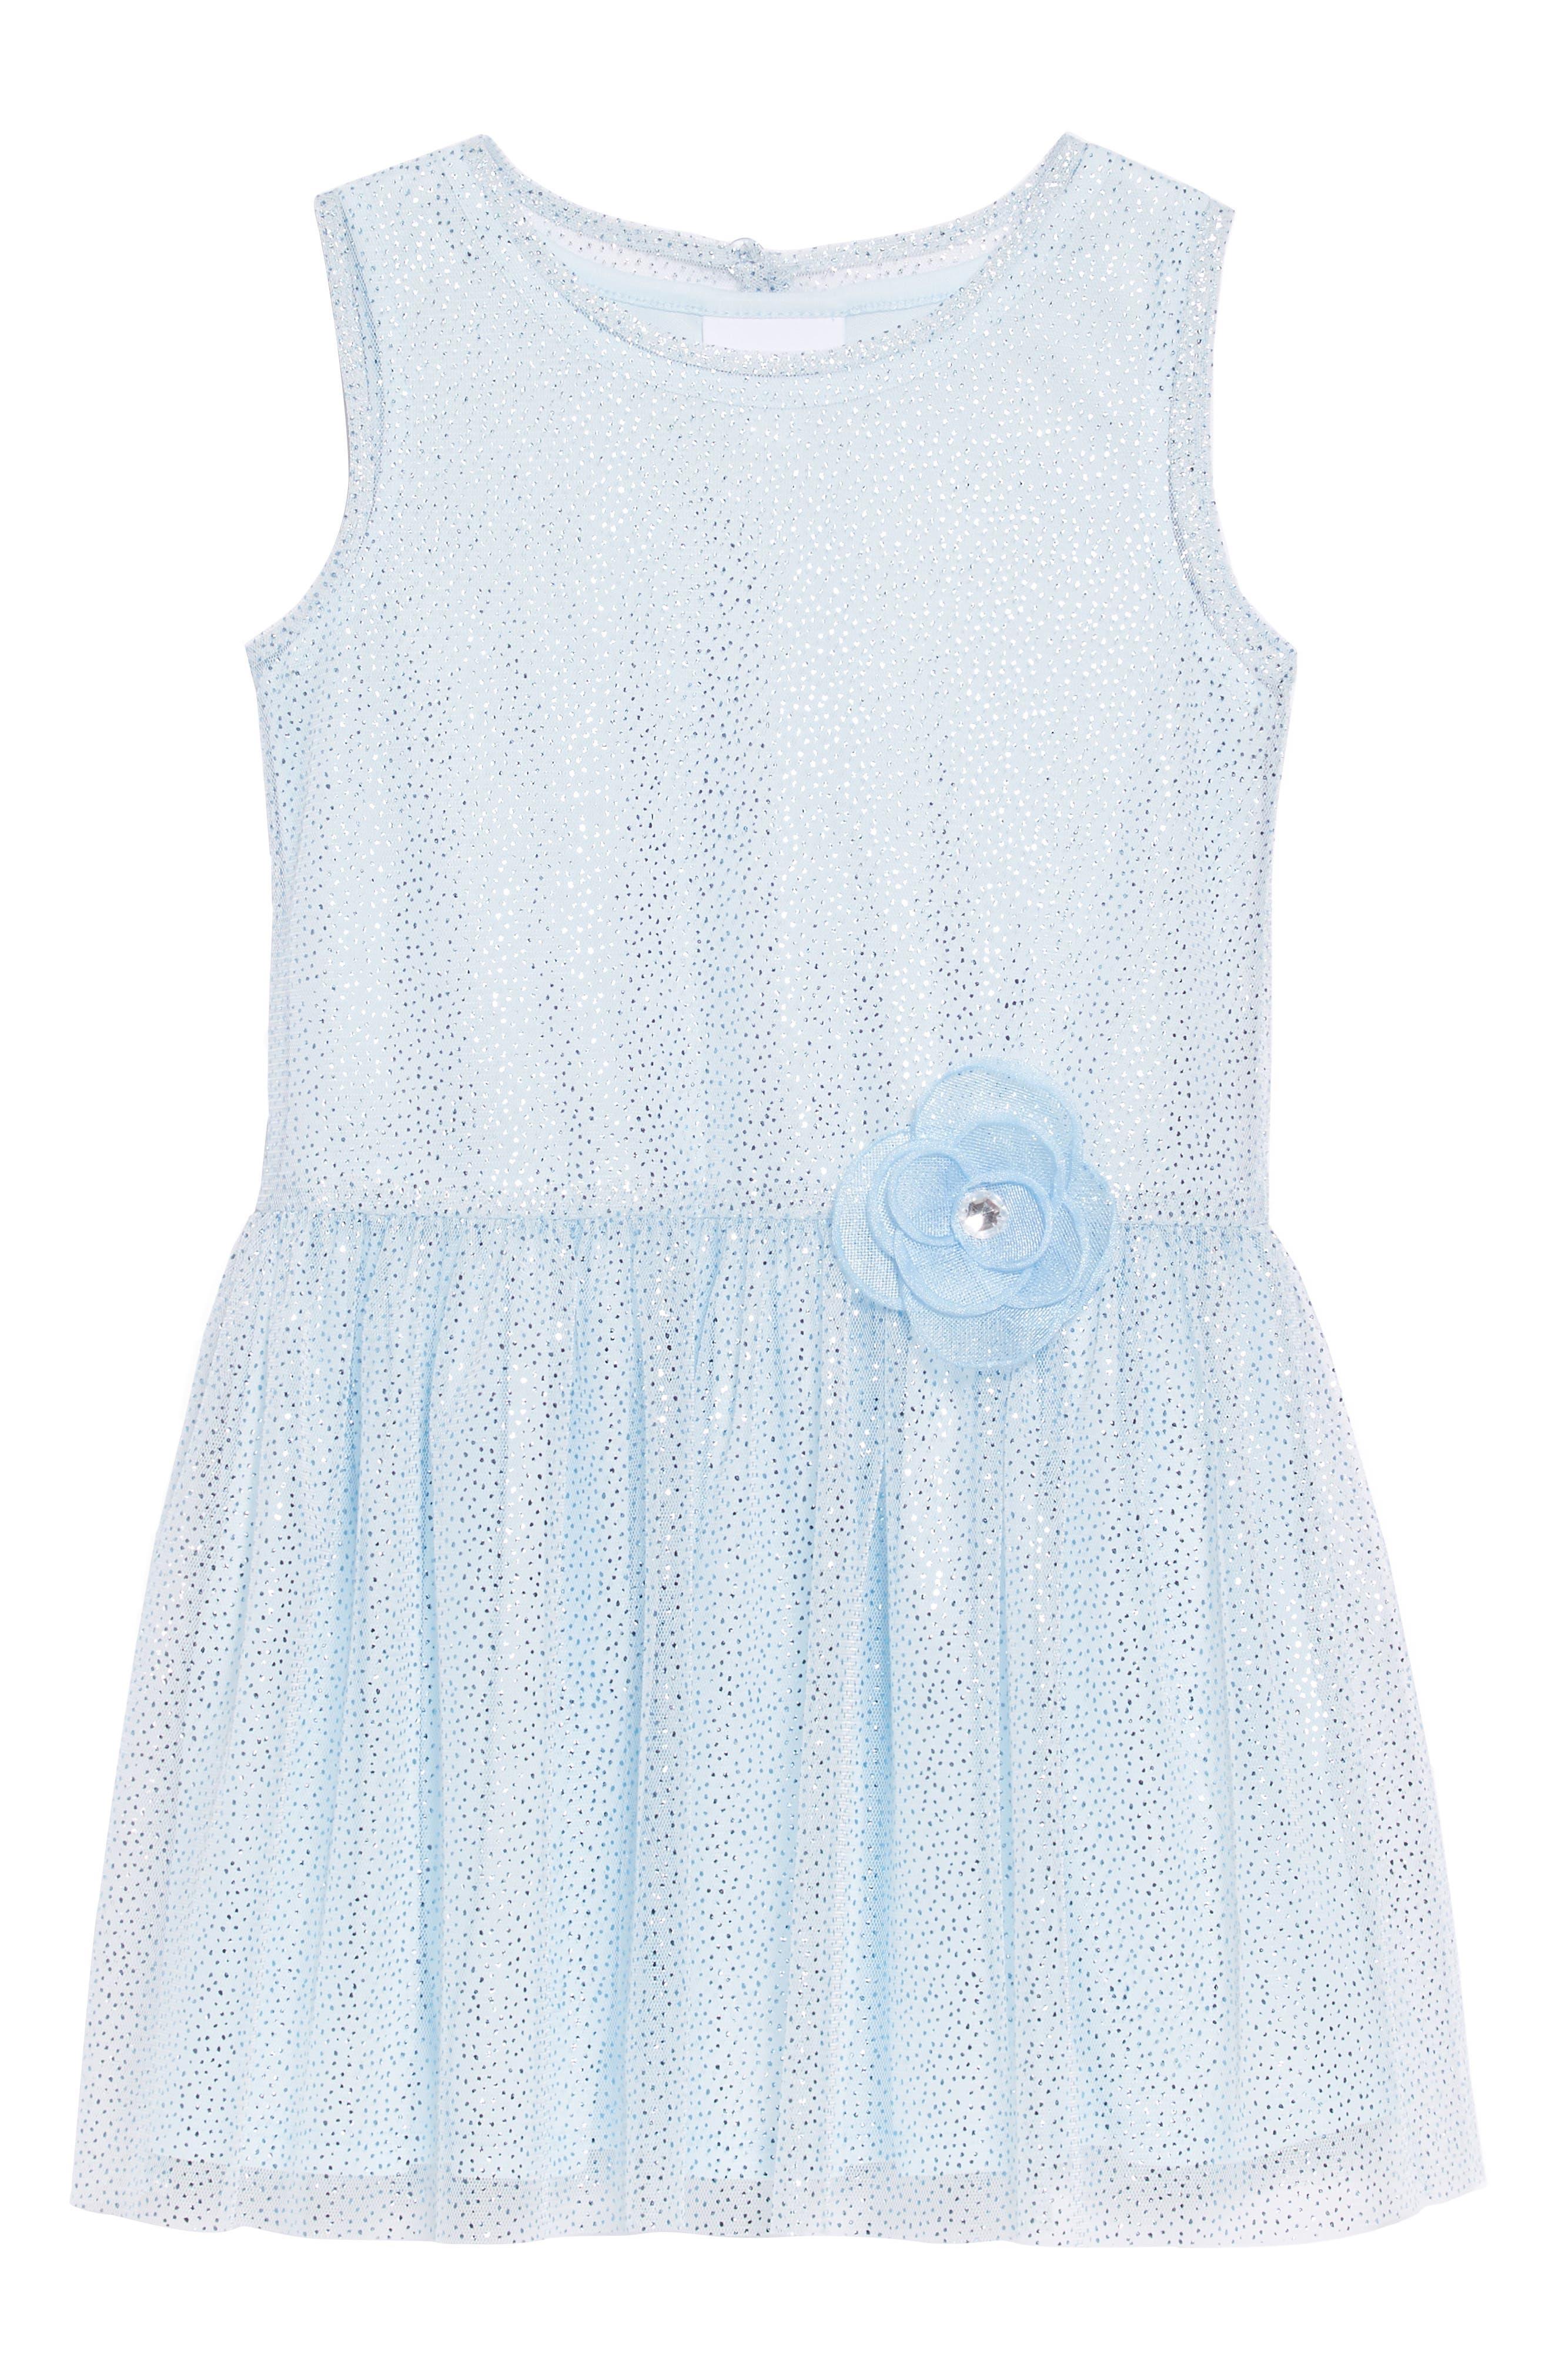 Sparkle Mesh Overlay Dress,                             Main thumbnail 1, color,                             450